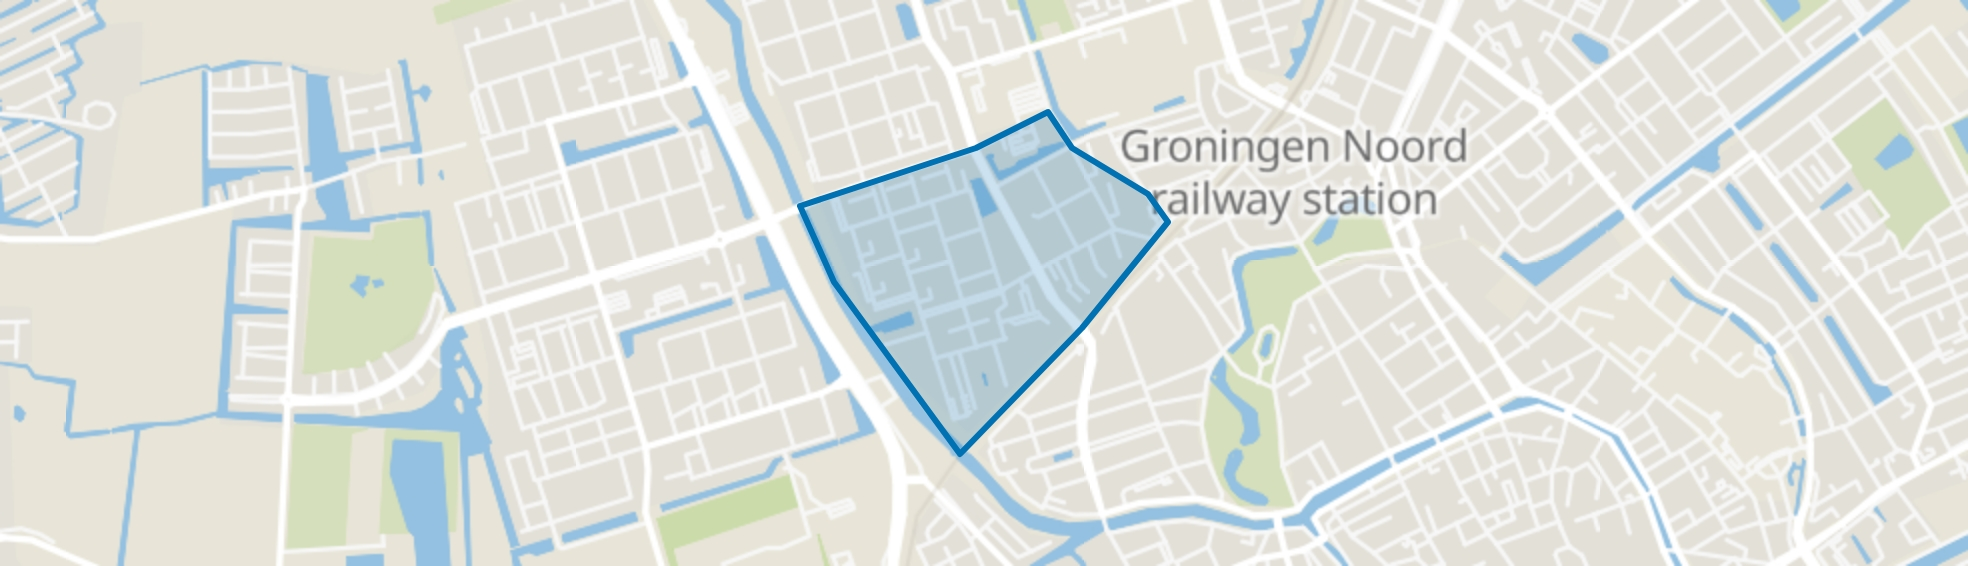 Paddepoel-Zuid, Groningen map